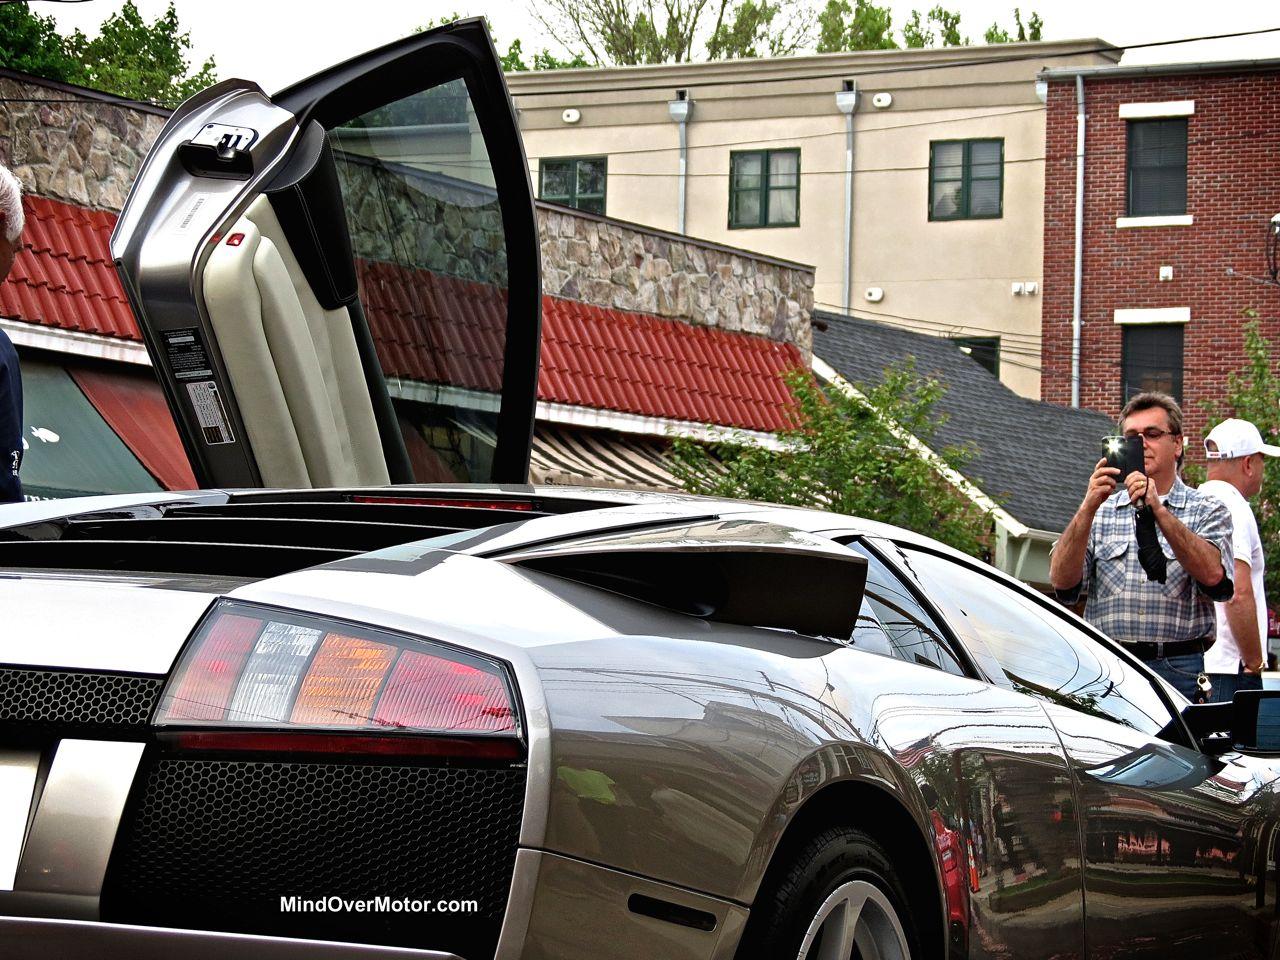 Lamborghini Murcielago in Clinton, NJ